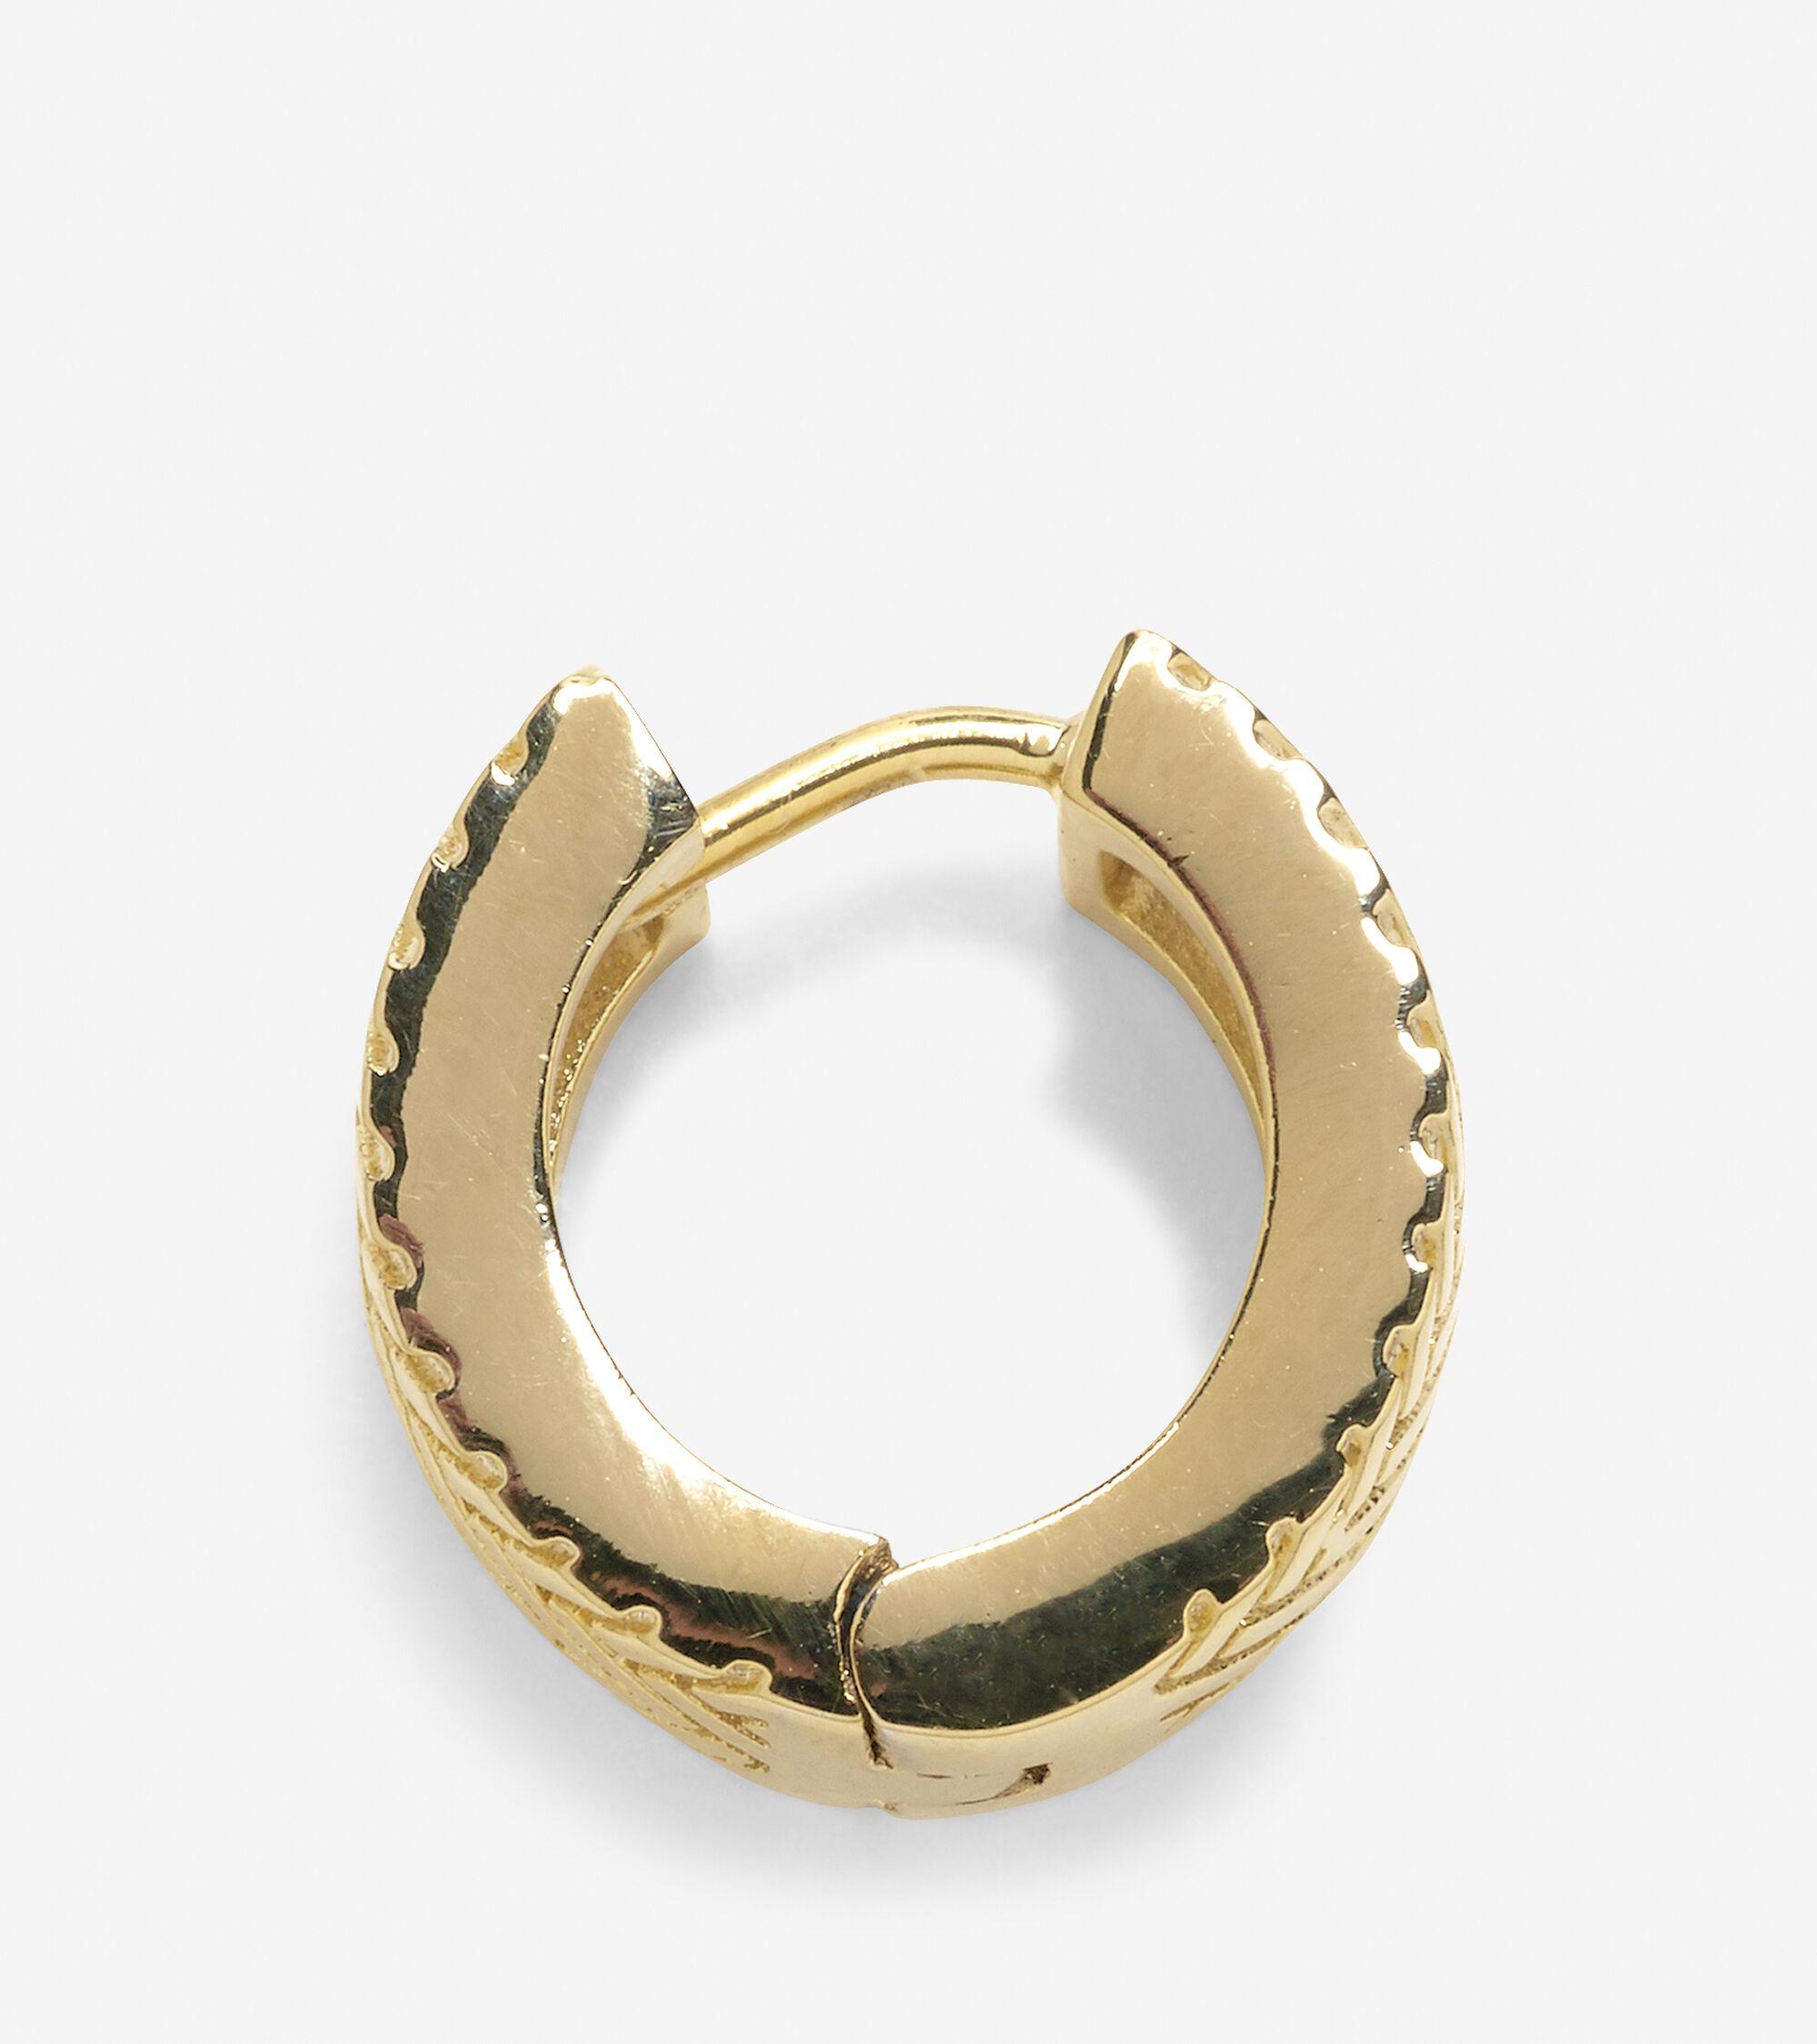 Basket Weave Huggy Earrings in Gold   Cole Haan